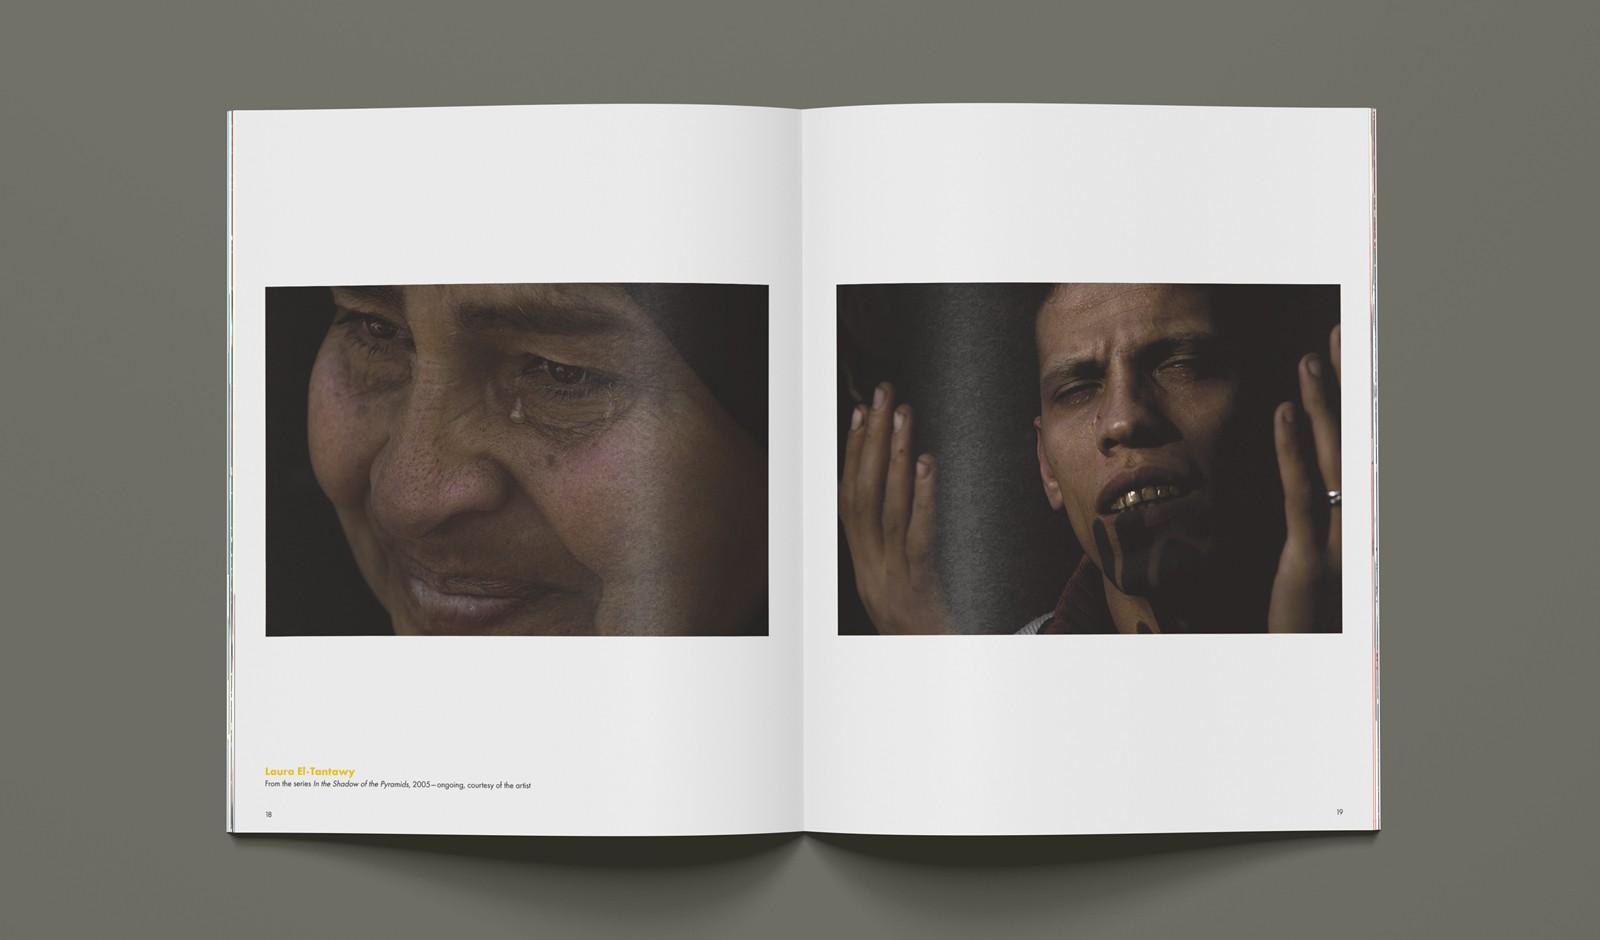 Exhibition catalogue: I Exist